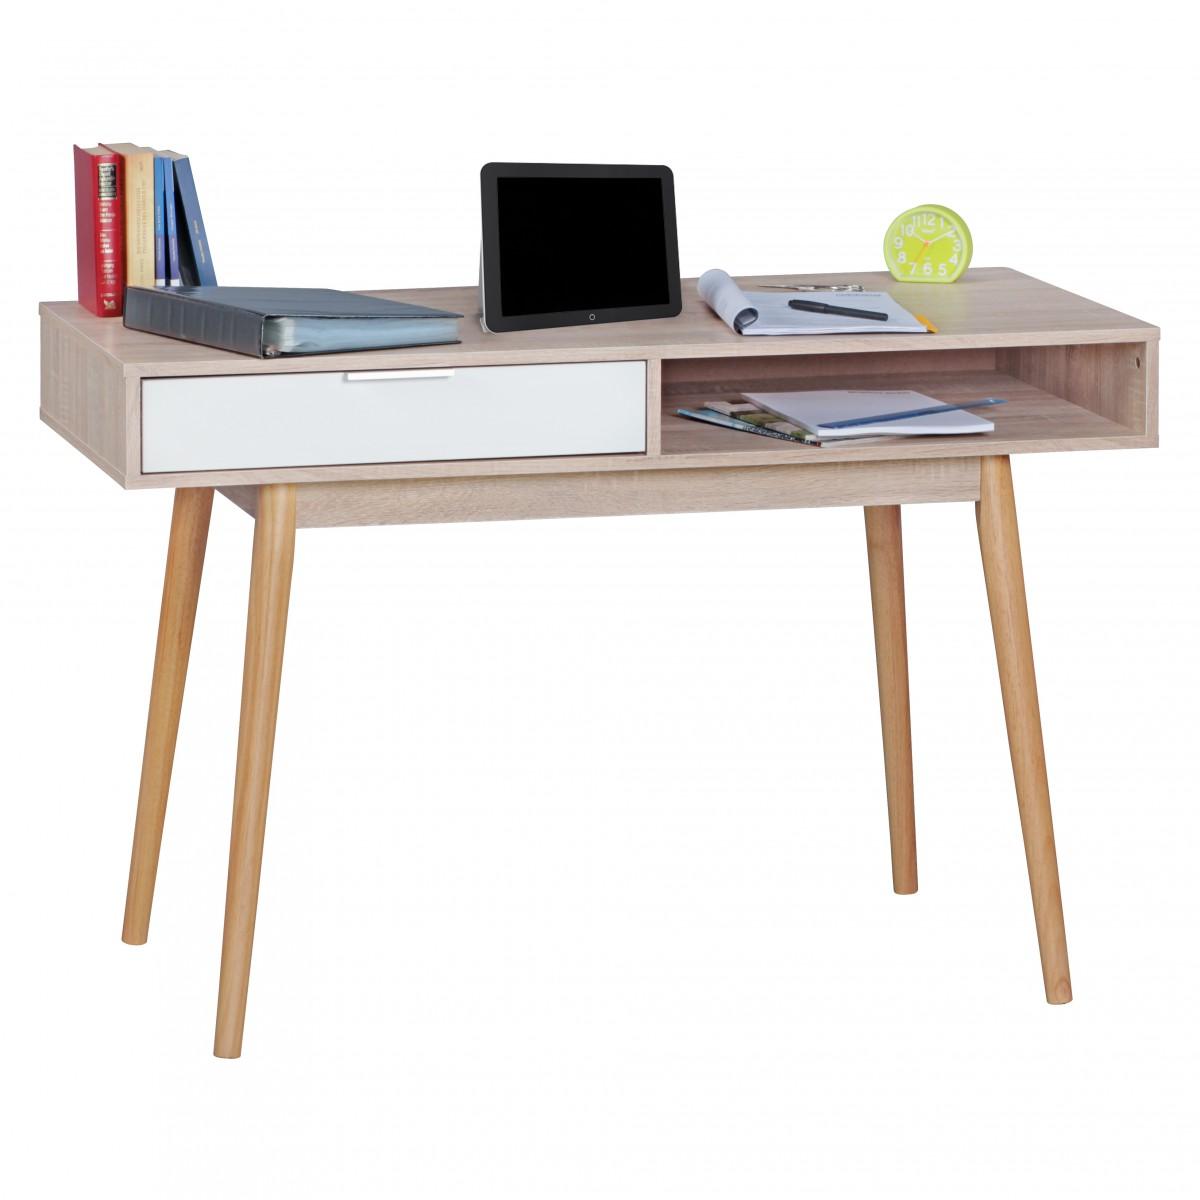 Psací retro stůl Samo, 120 cm, Sonoma dub/bílá